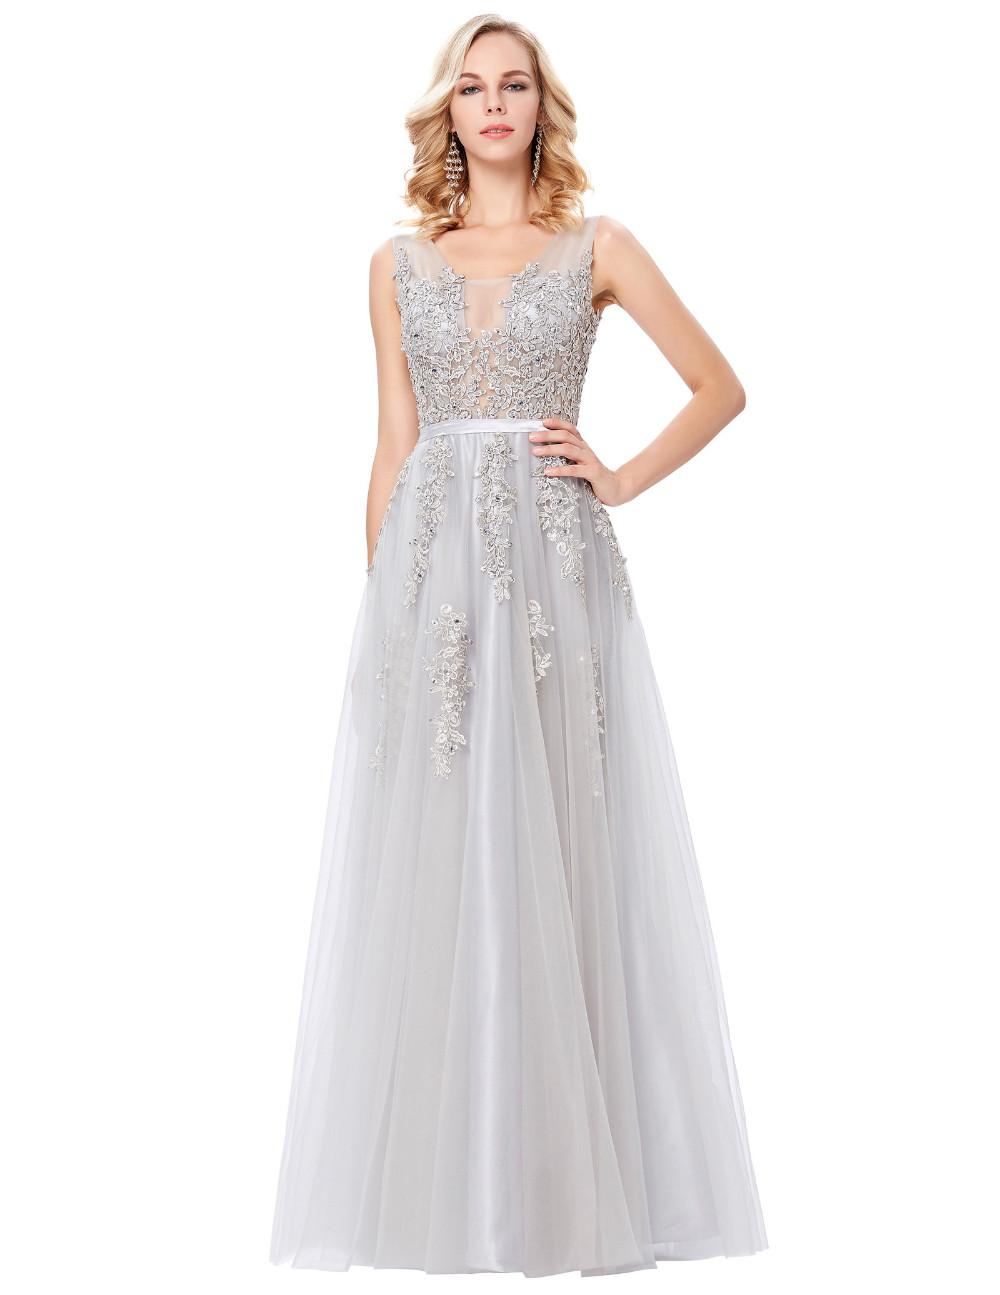 Grace Karin Tulle Appliques Celebrity Prom Dress Sexy V Back Sleeveless Long Royal Blue Robes De Soiree 2017 Longue Prom Dresses 18